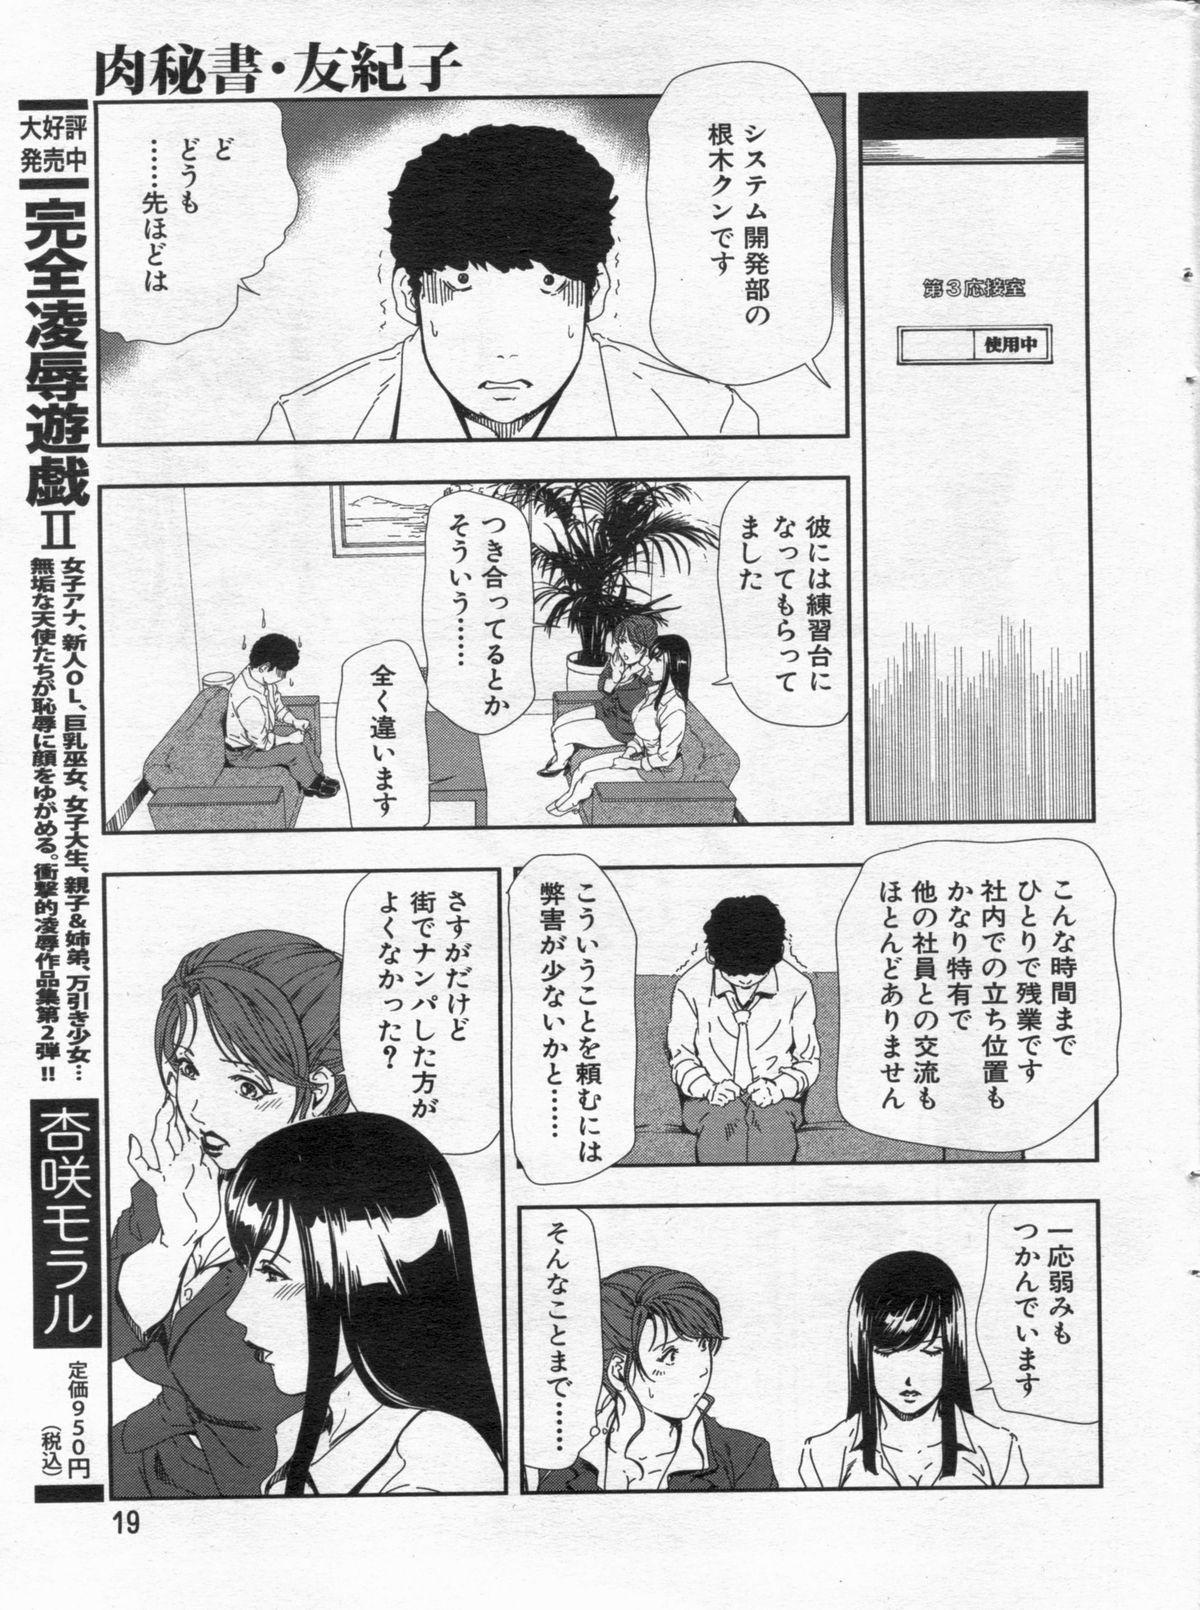 Manga Bon 2013-02 18